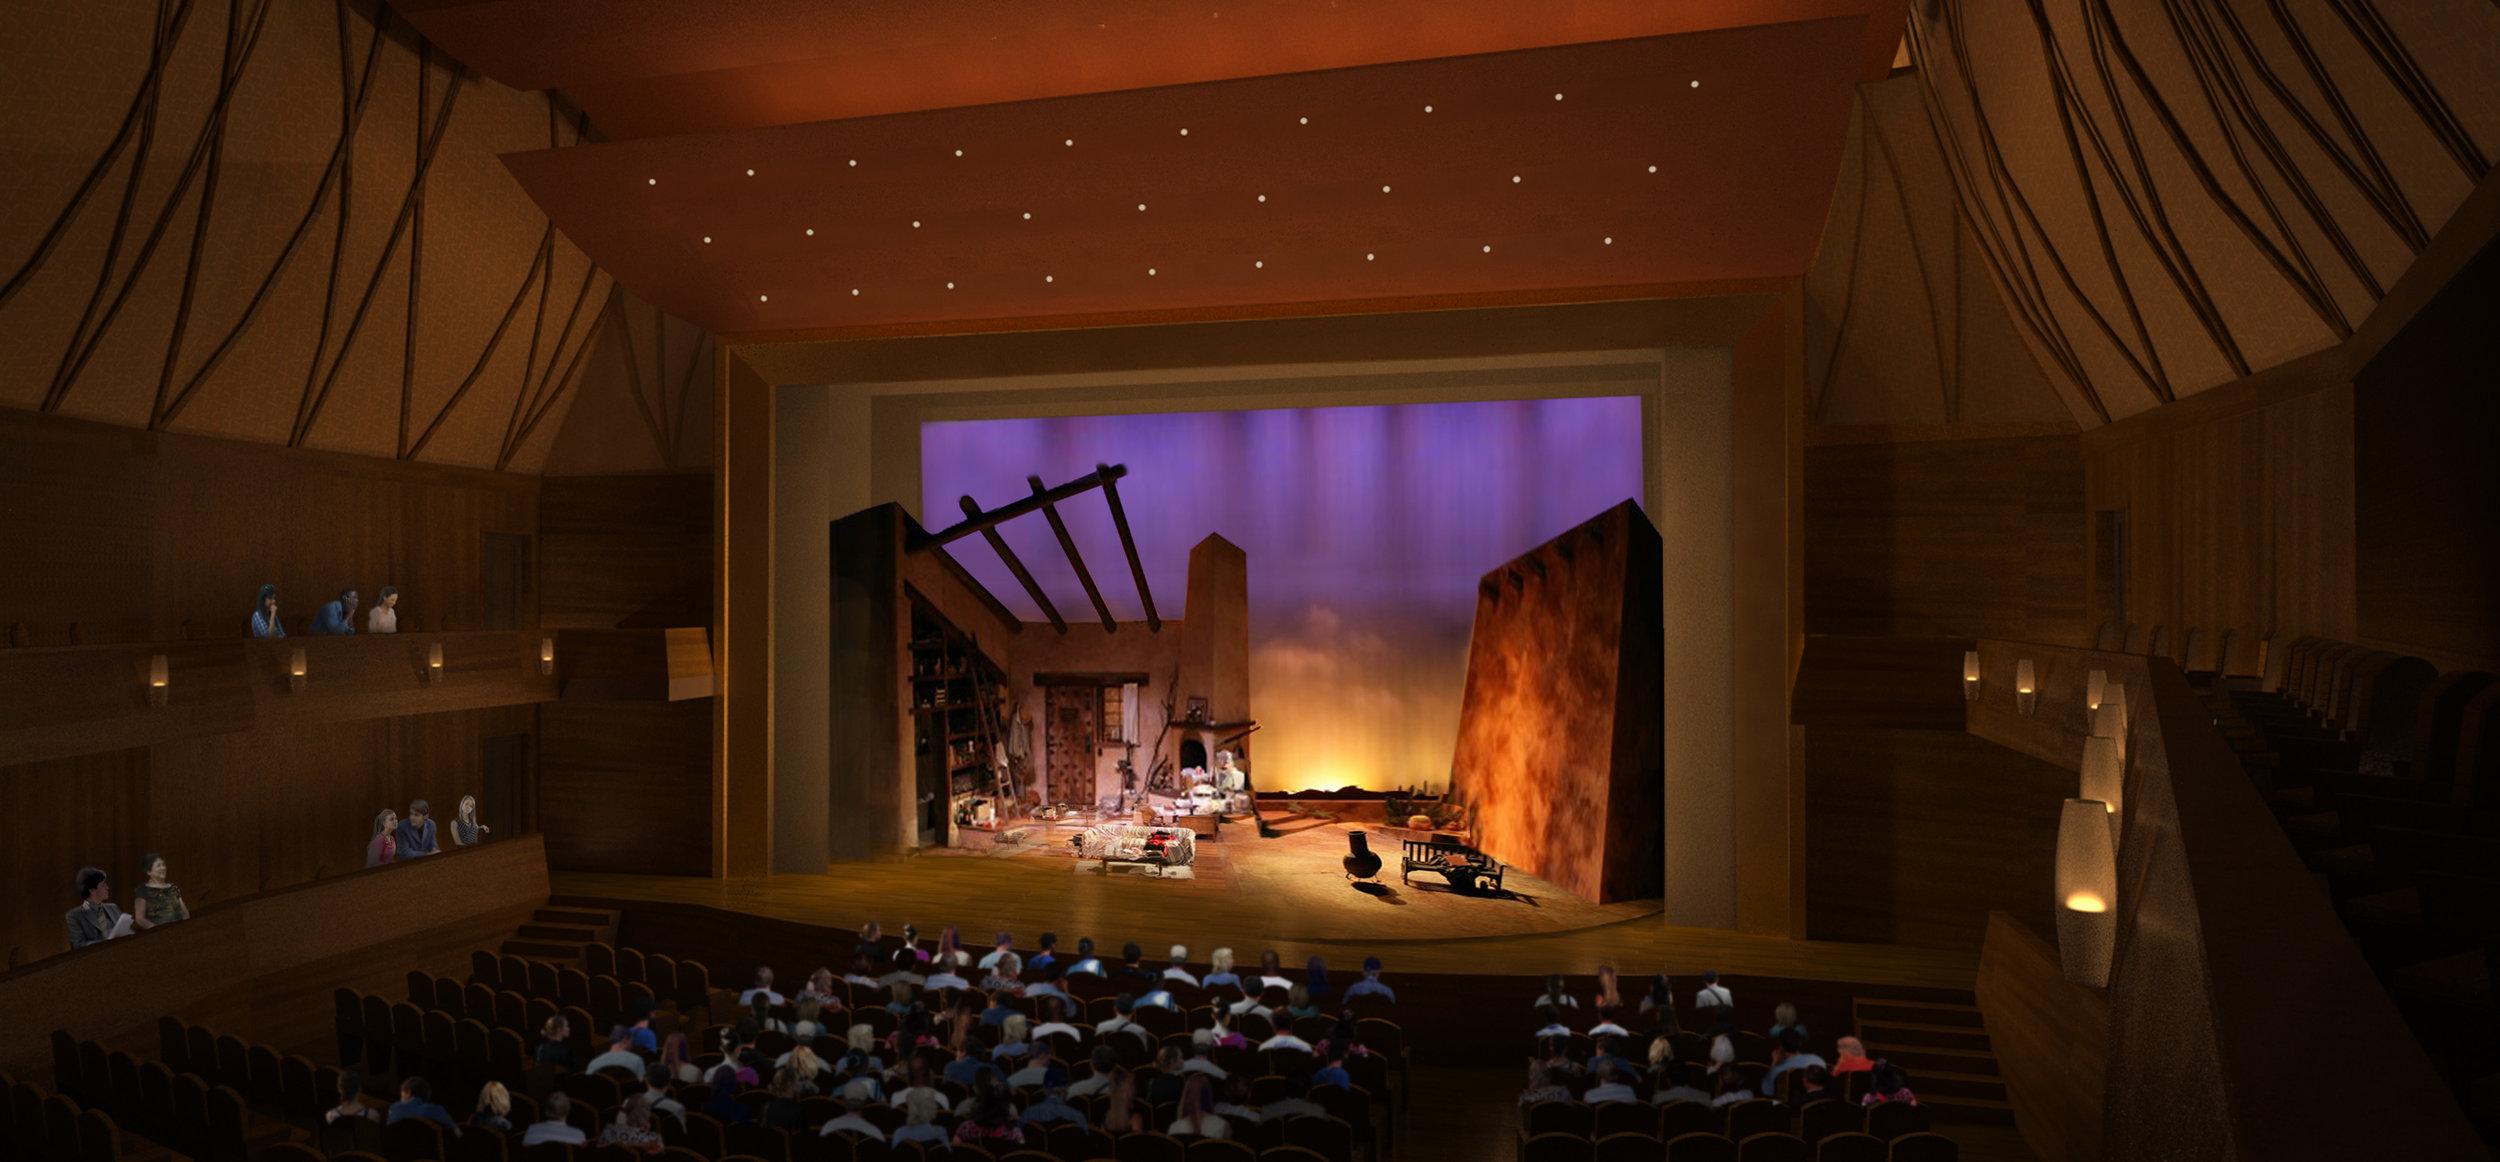 Holy-Cross-Performing-Arts-Epstein-Joslin-09.jpg